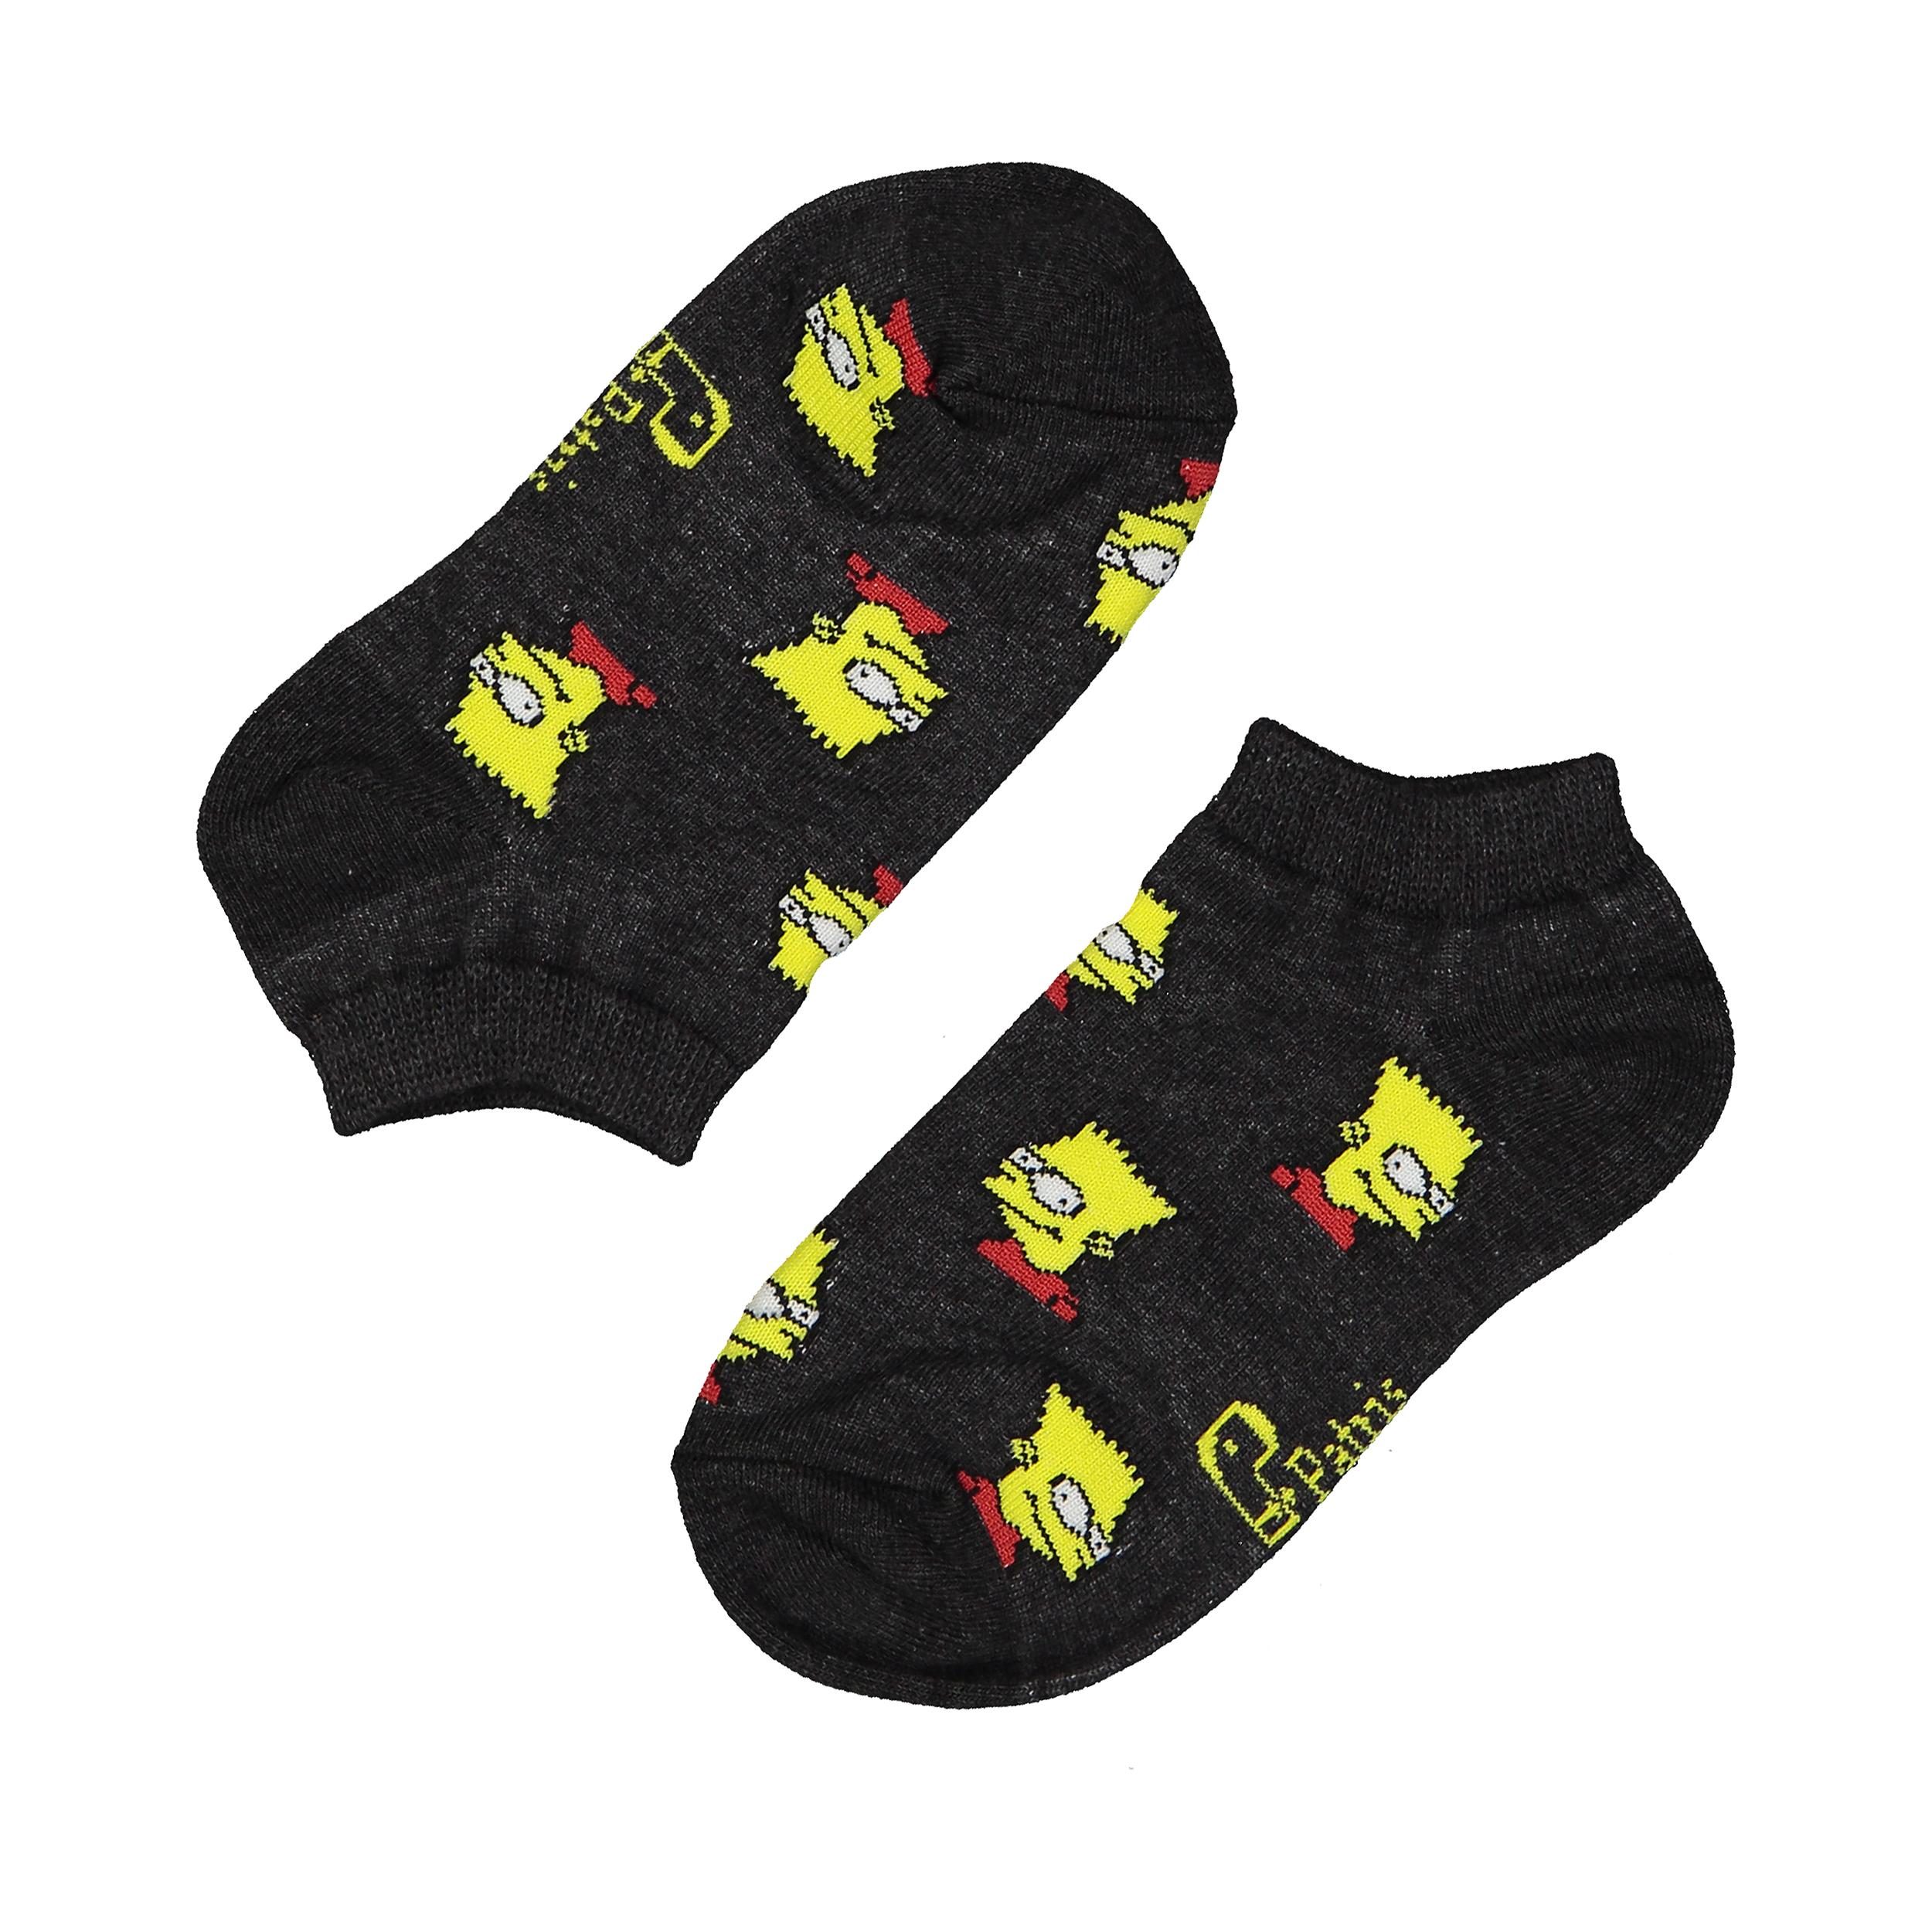 جوراب بچگانه پاتریس طرح سیمپسون مدل 2271192-94